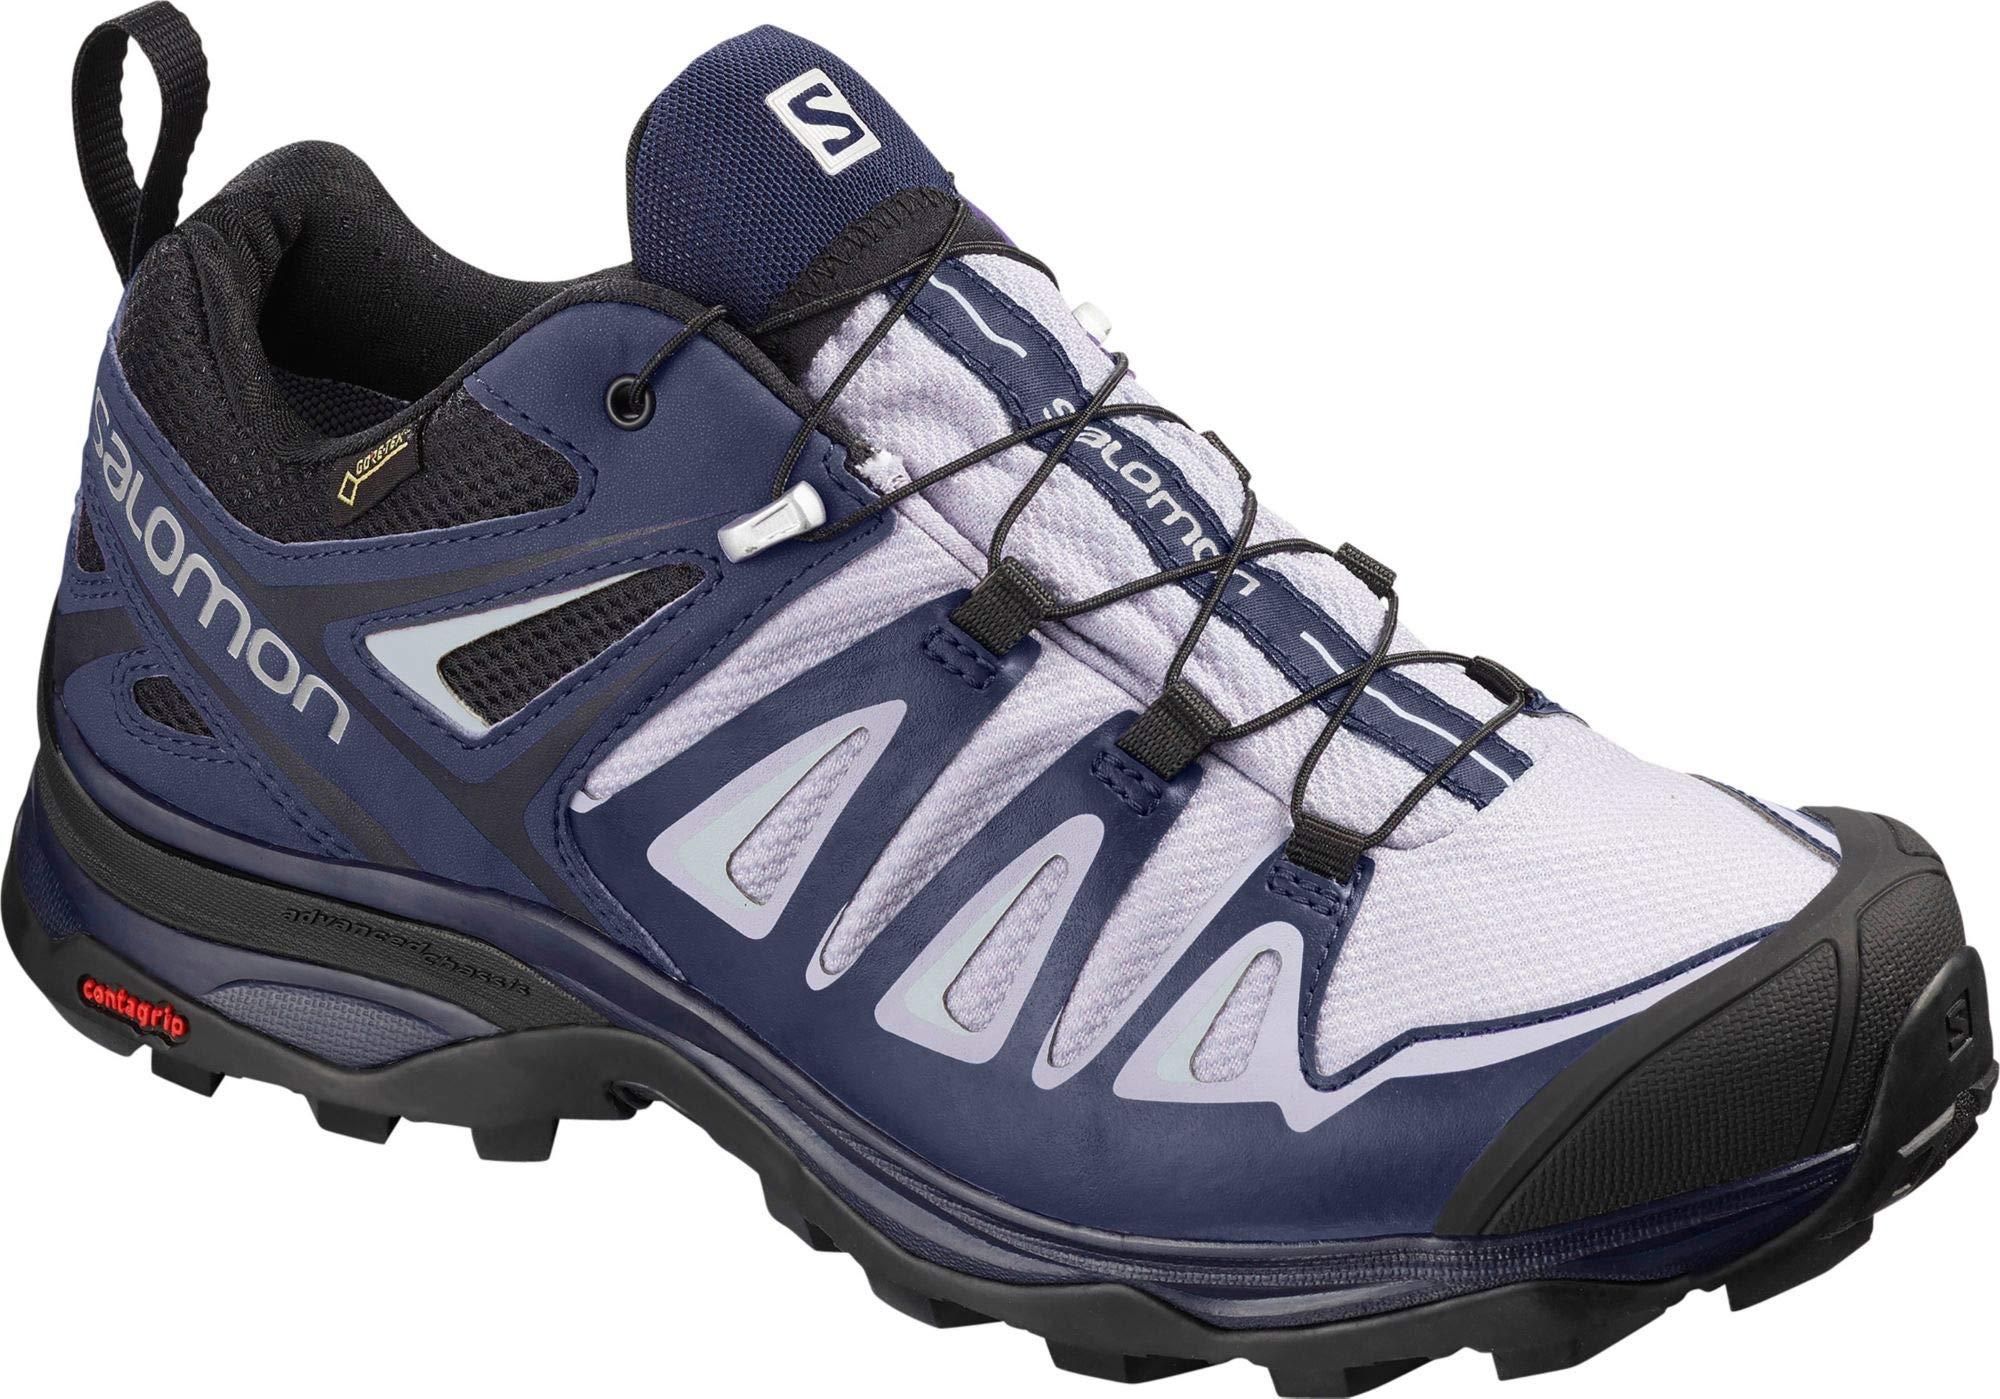 Salomon Women's X Ultra 3 GTX Hiking Shoes, Languid Lavender/Crown Blue/Navy Blazer, 5.5 M US